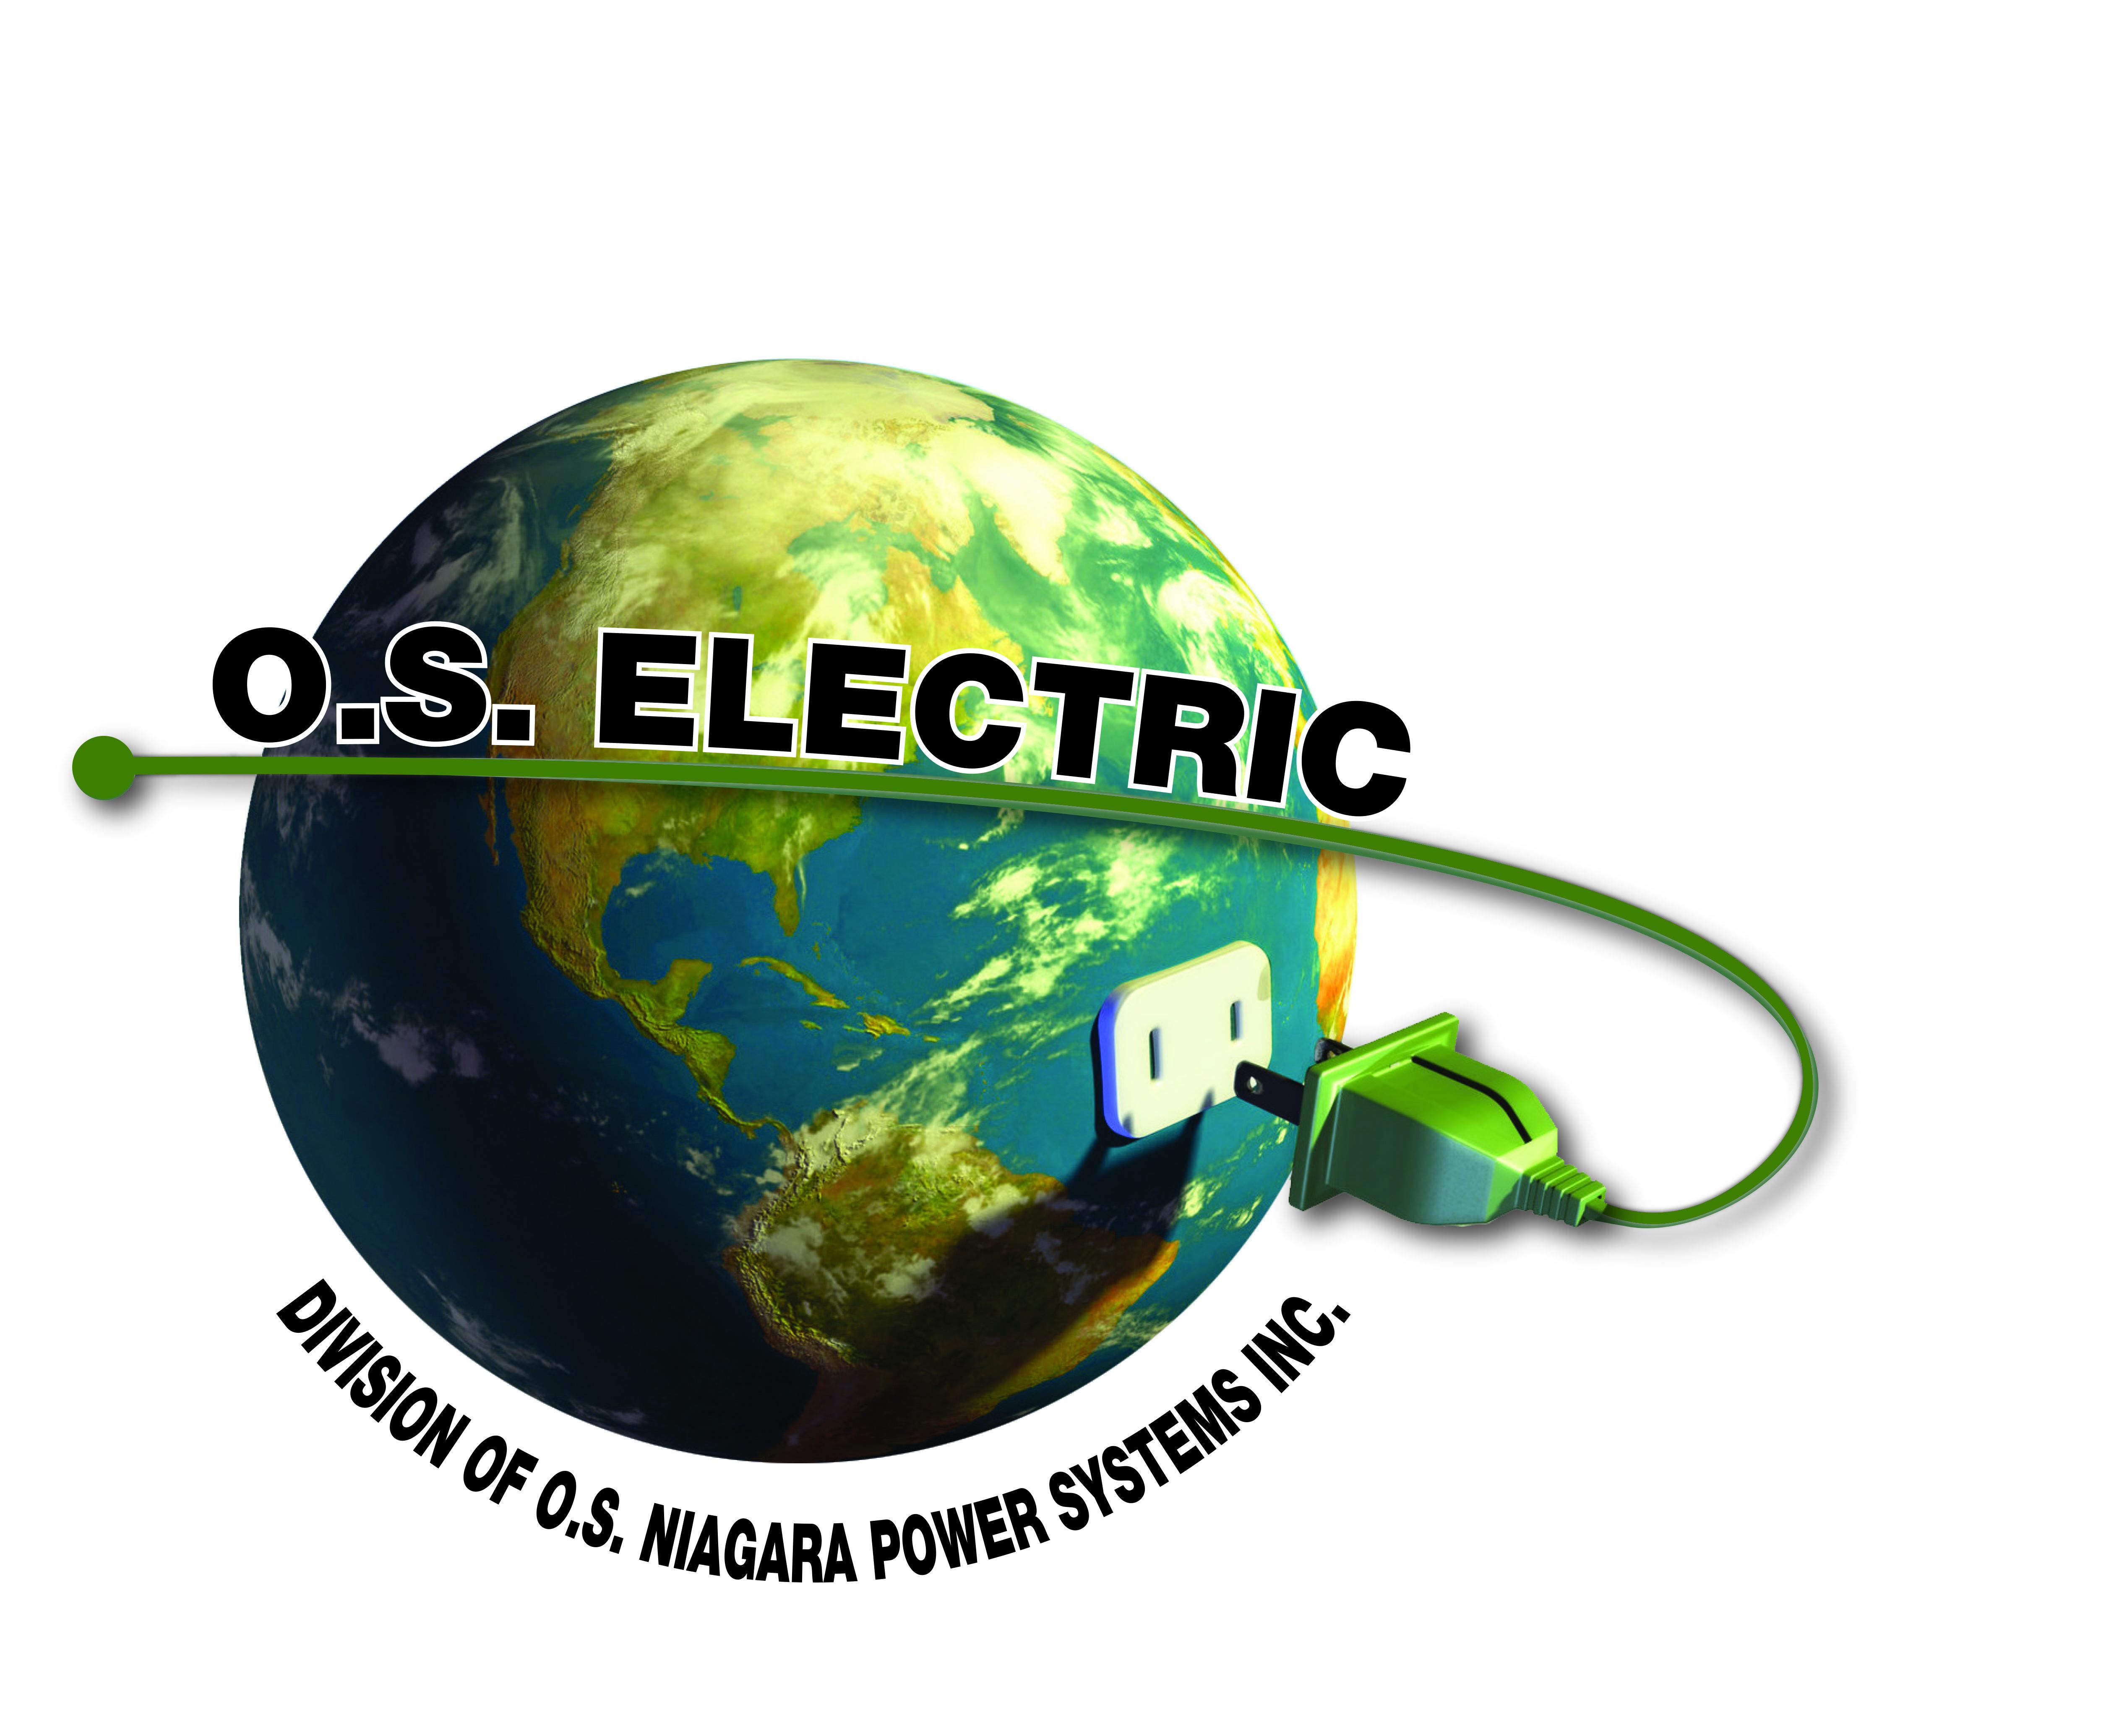 O.S. Electric